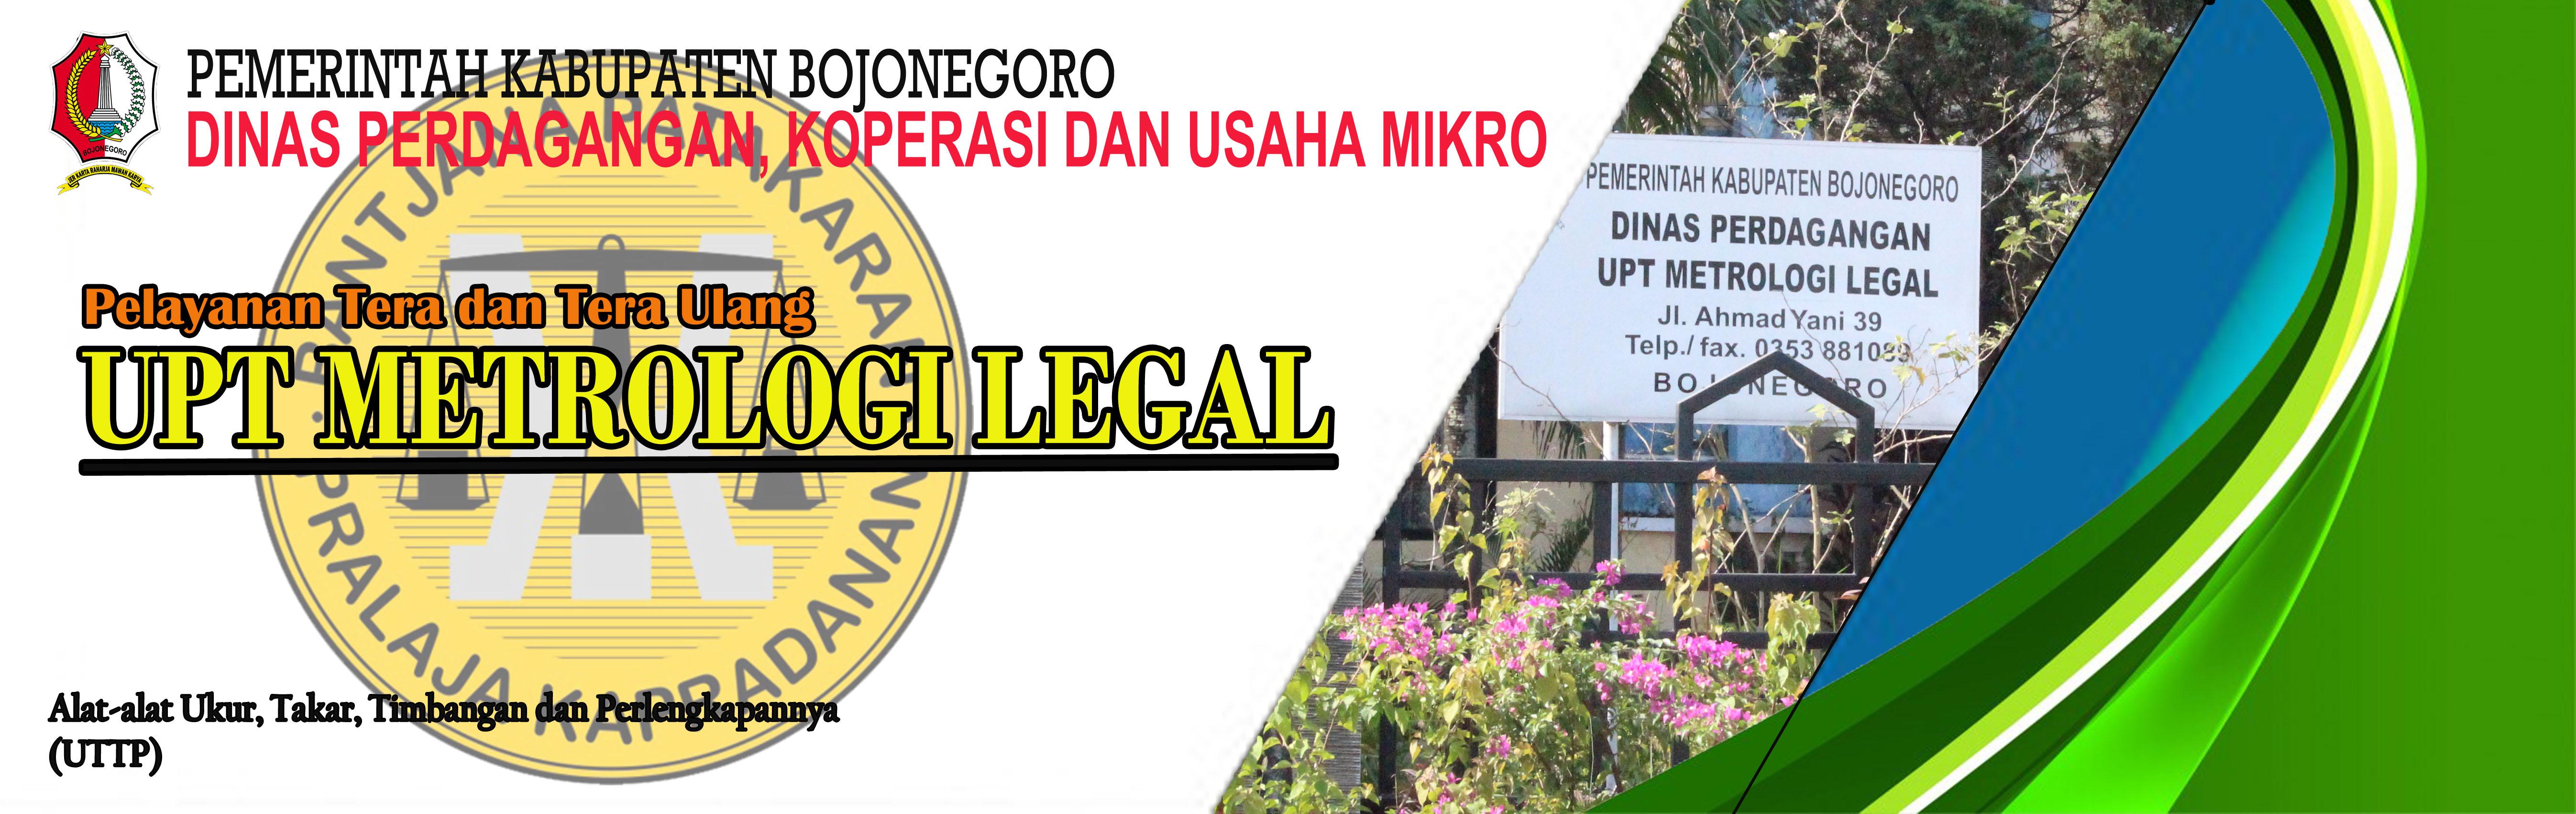 UPT. METROLOGI LEGAL<BR>DINAS PERDAGANGAN KOPERASI DAN USAHA MIKRO